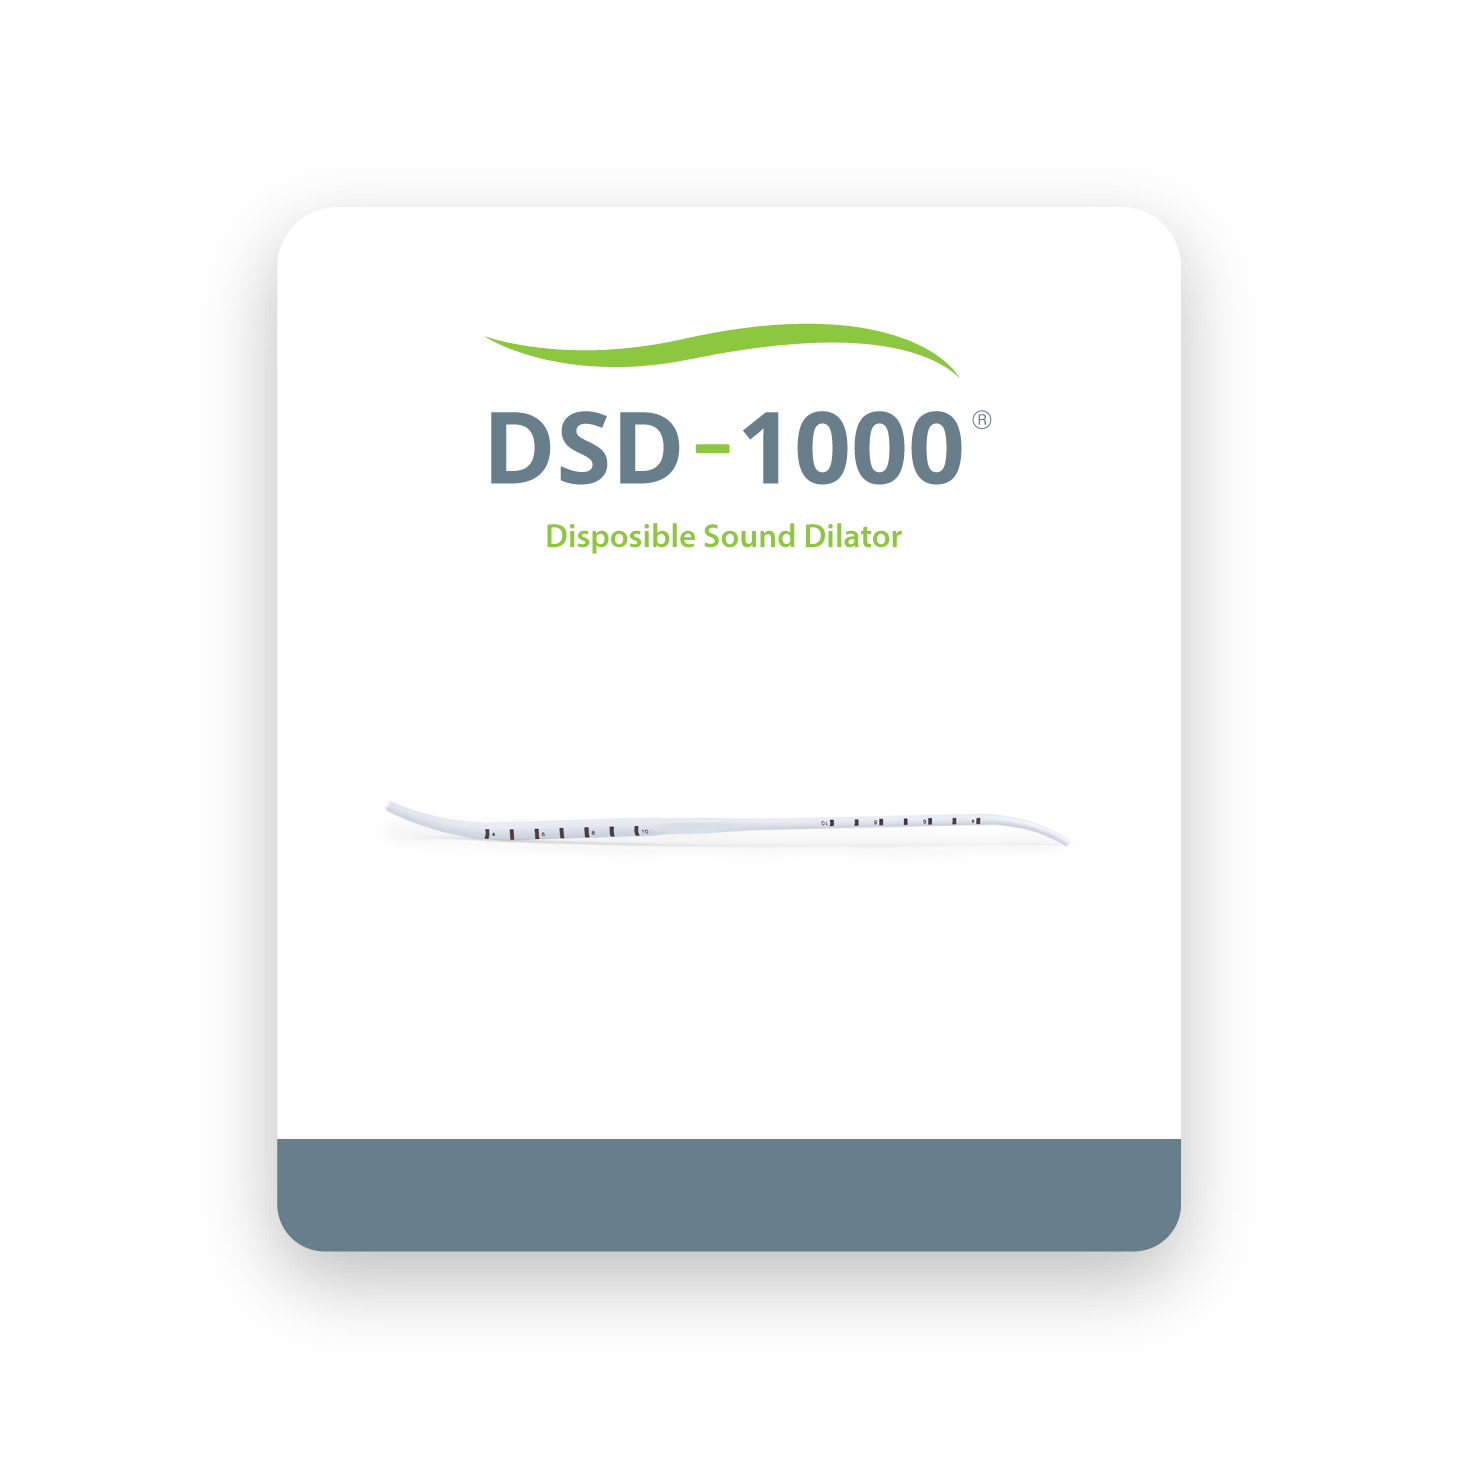 DSD-1000 Sound Dilator